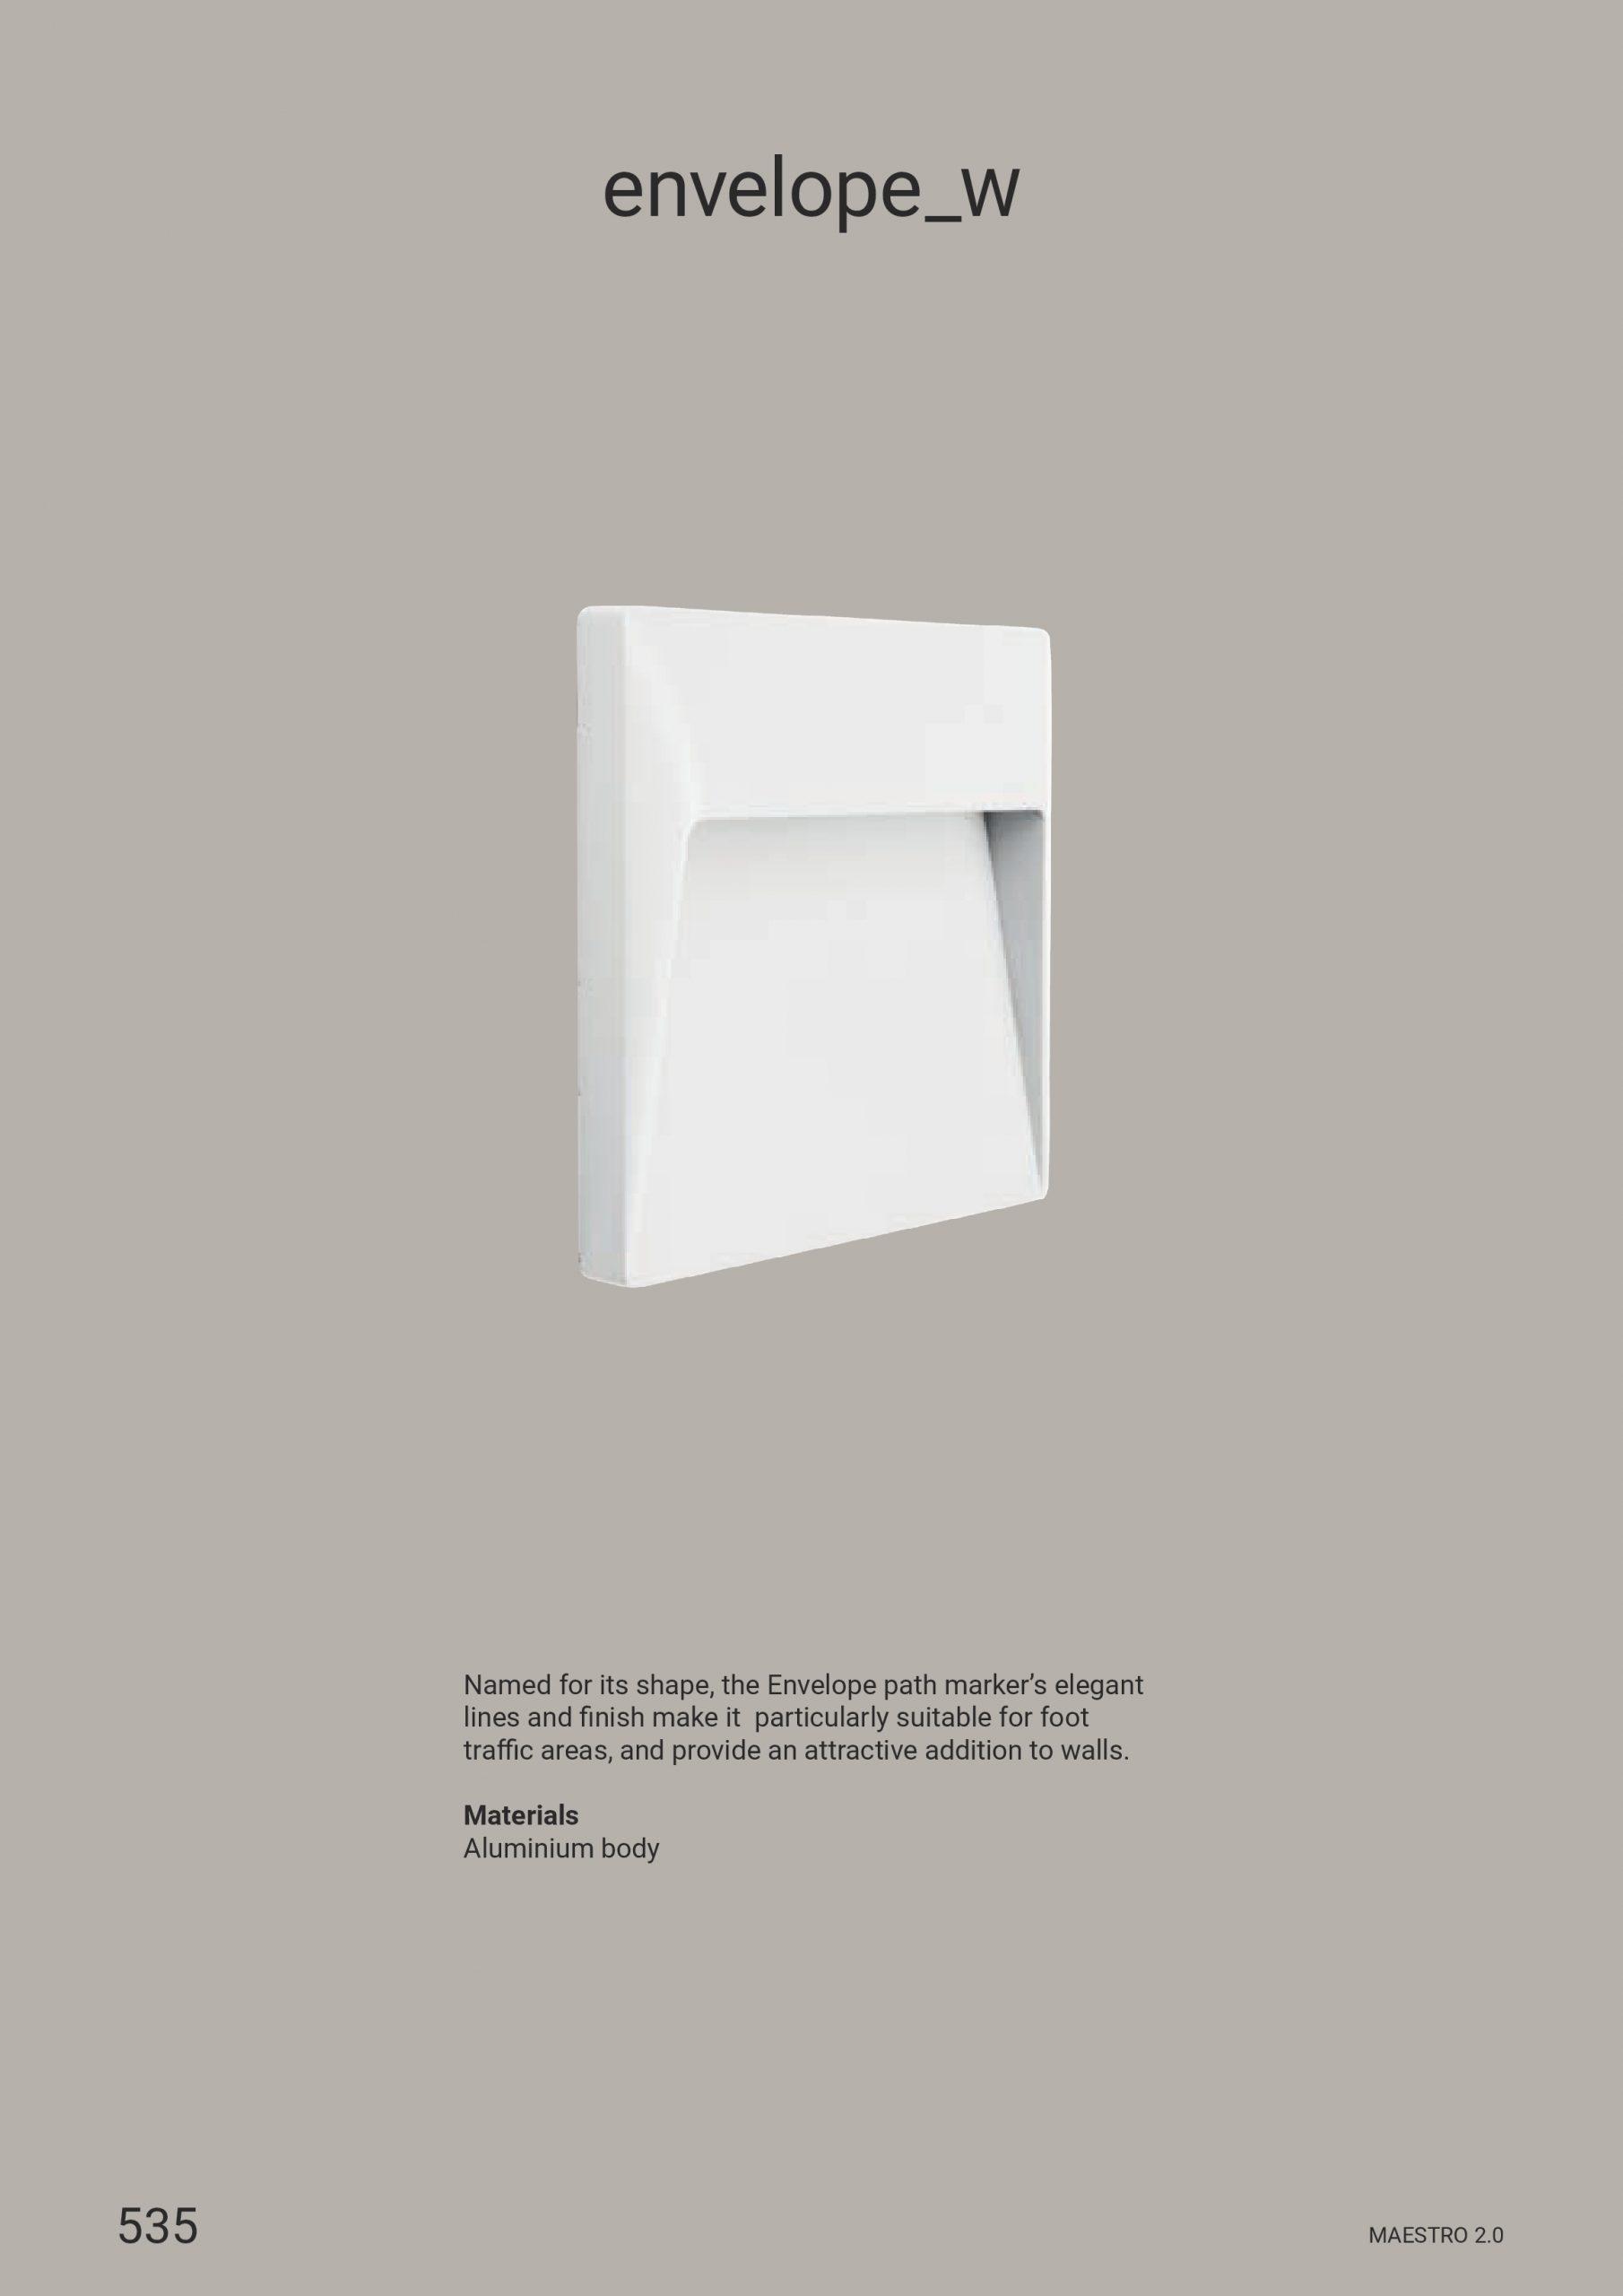 Linea Light – Envelope_W